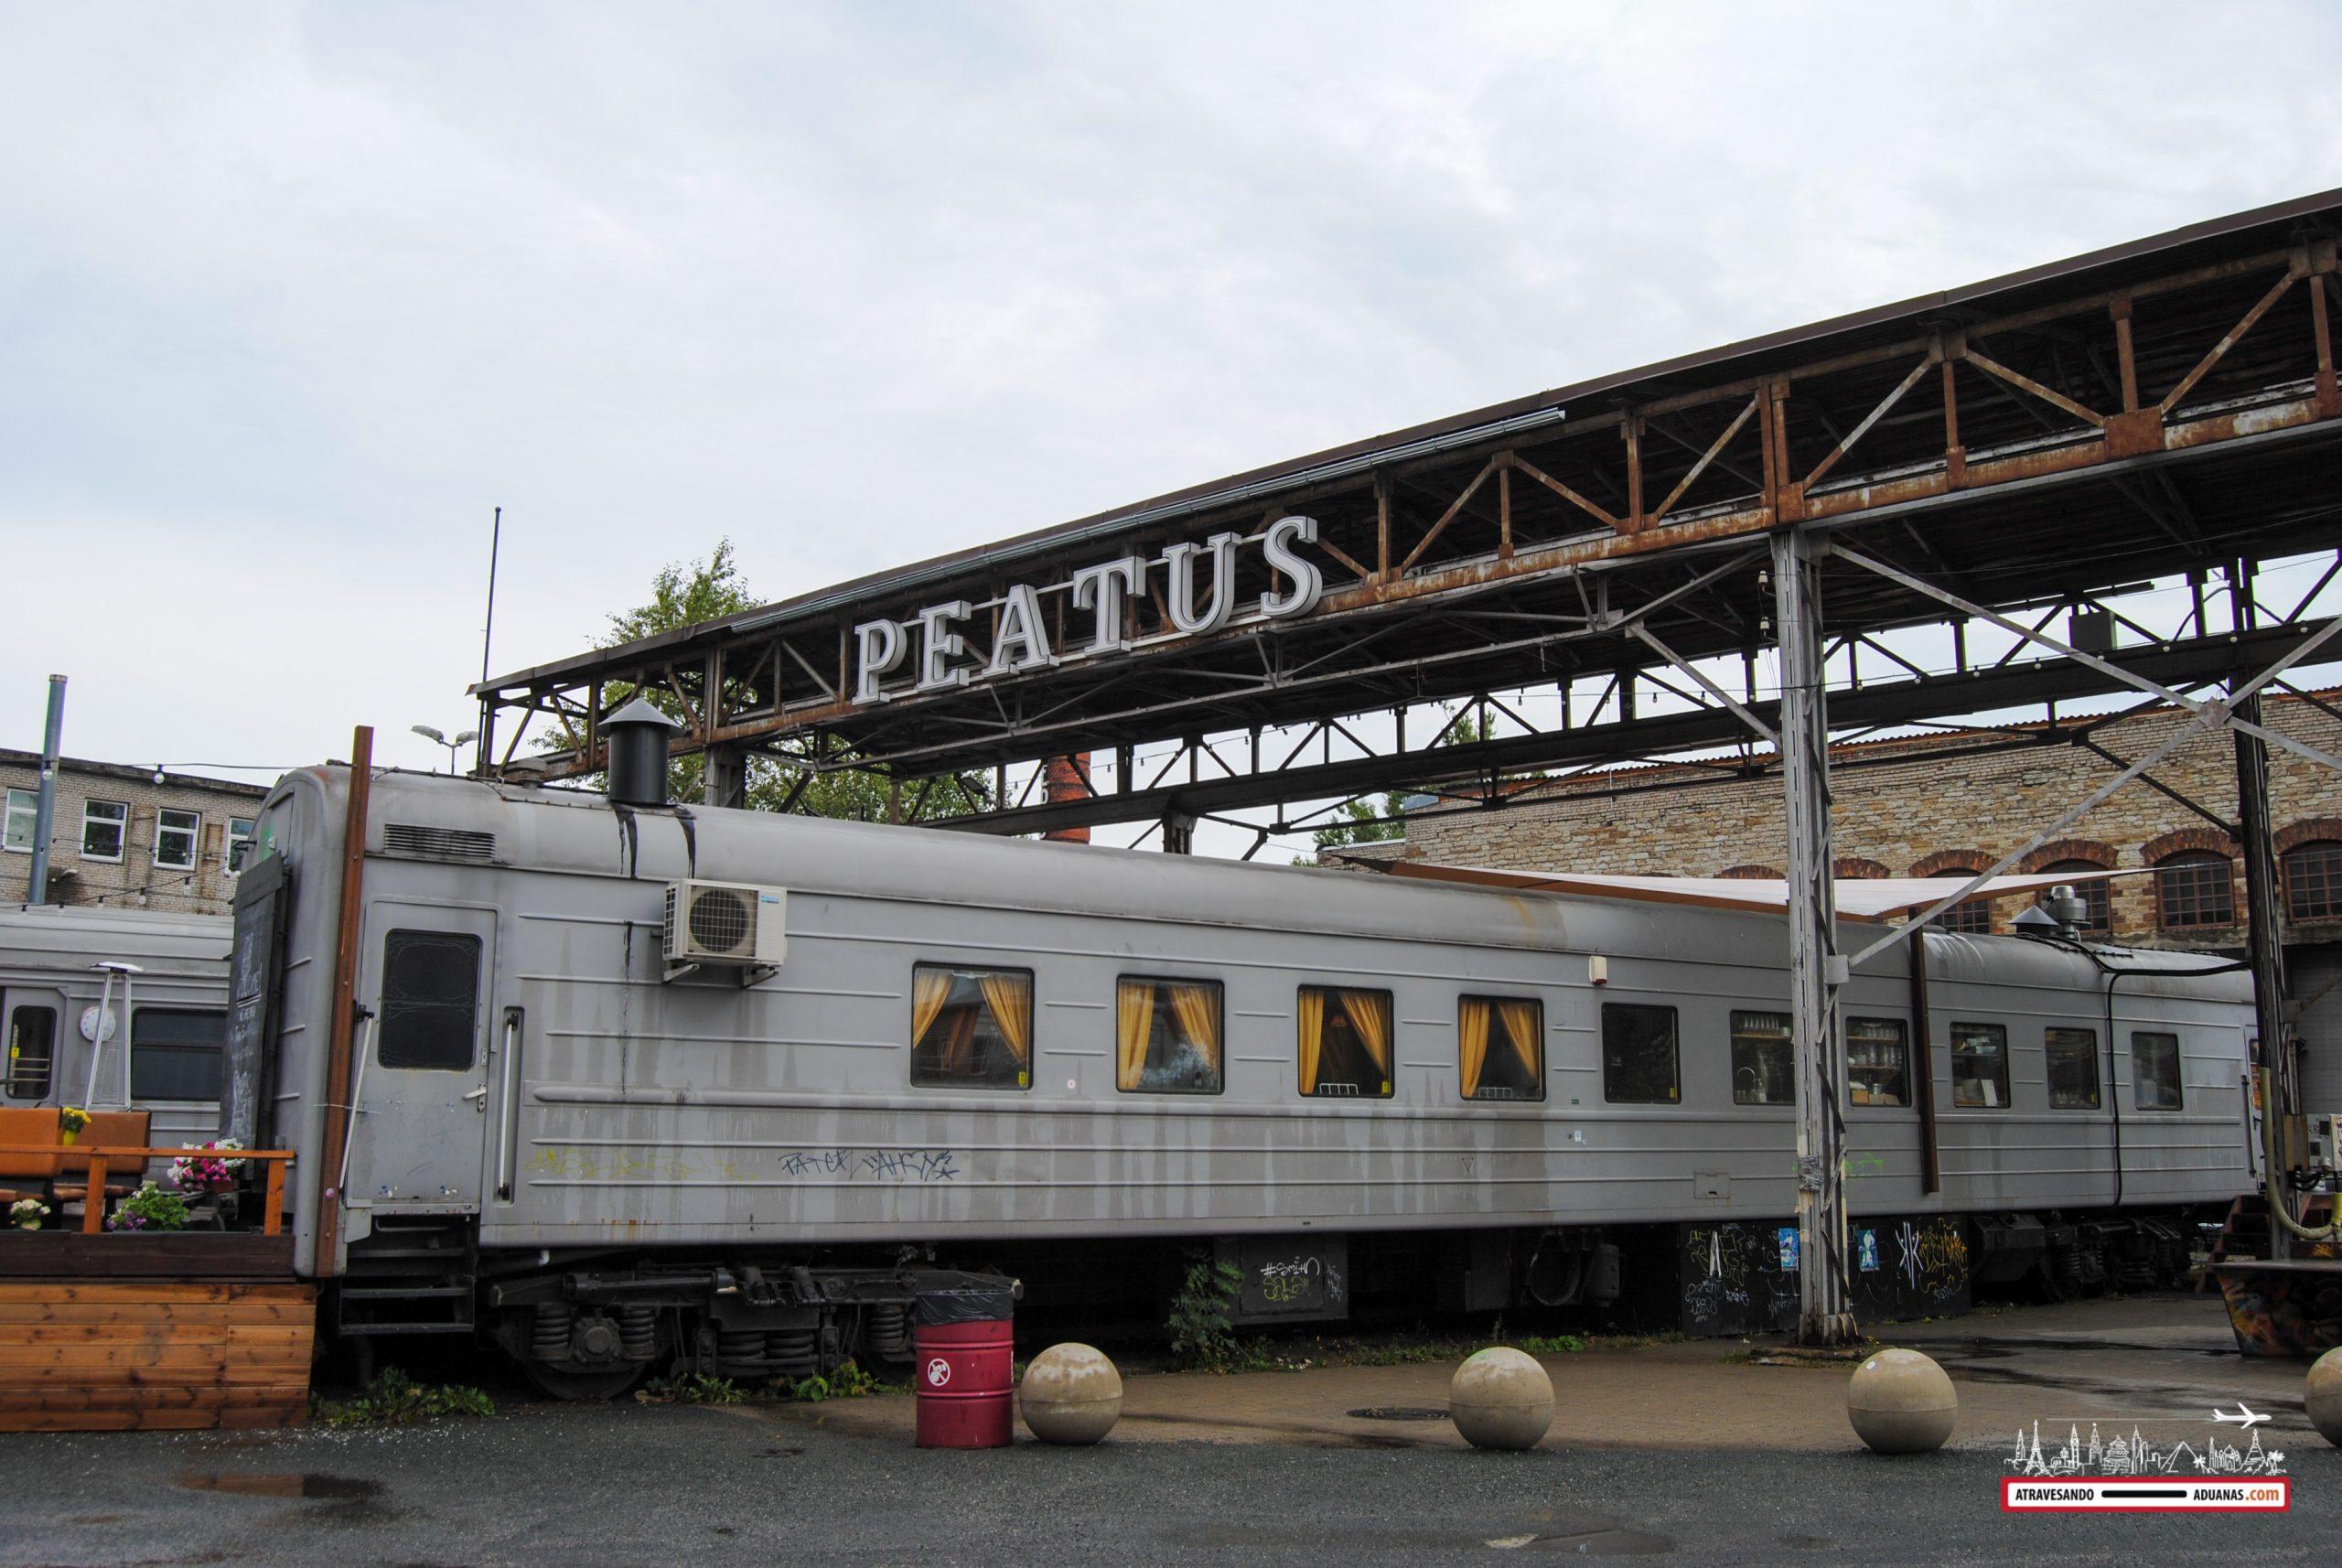 vagón de tren - restaurante, tallinn